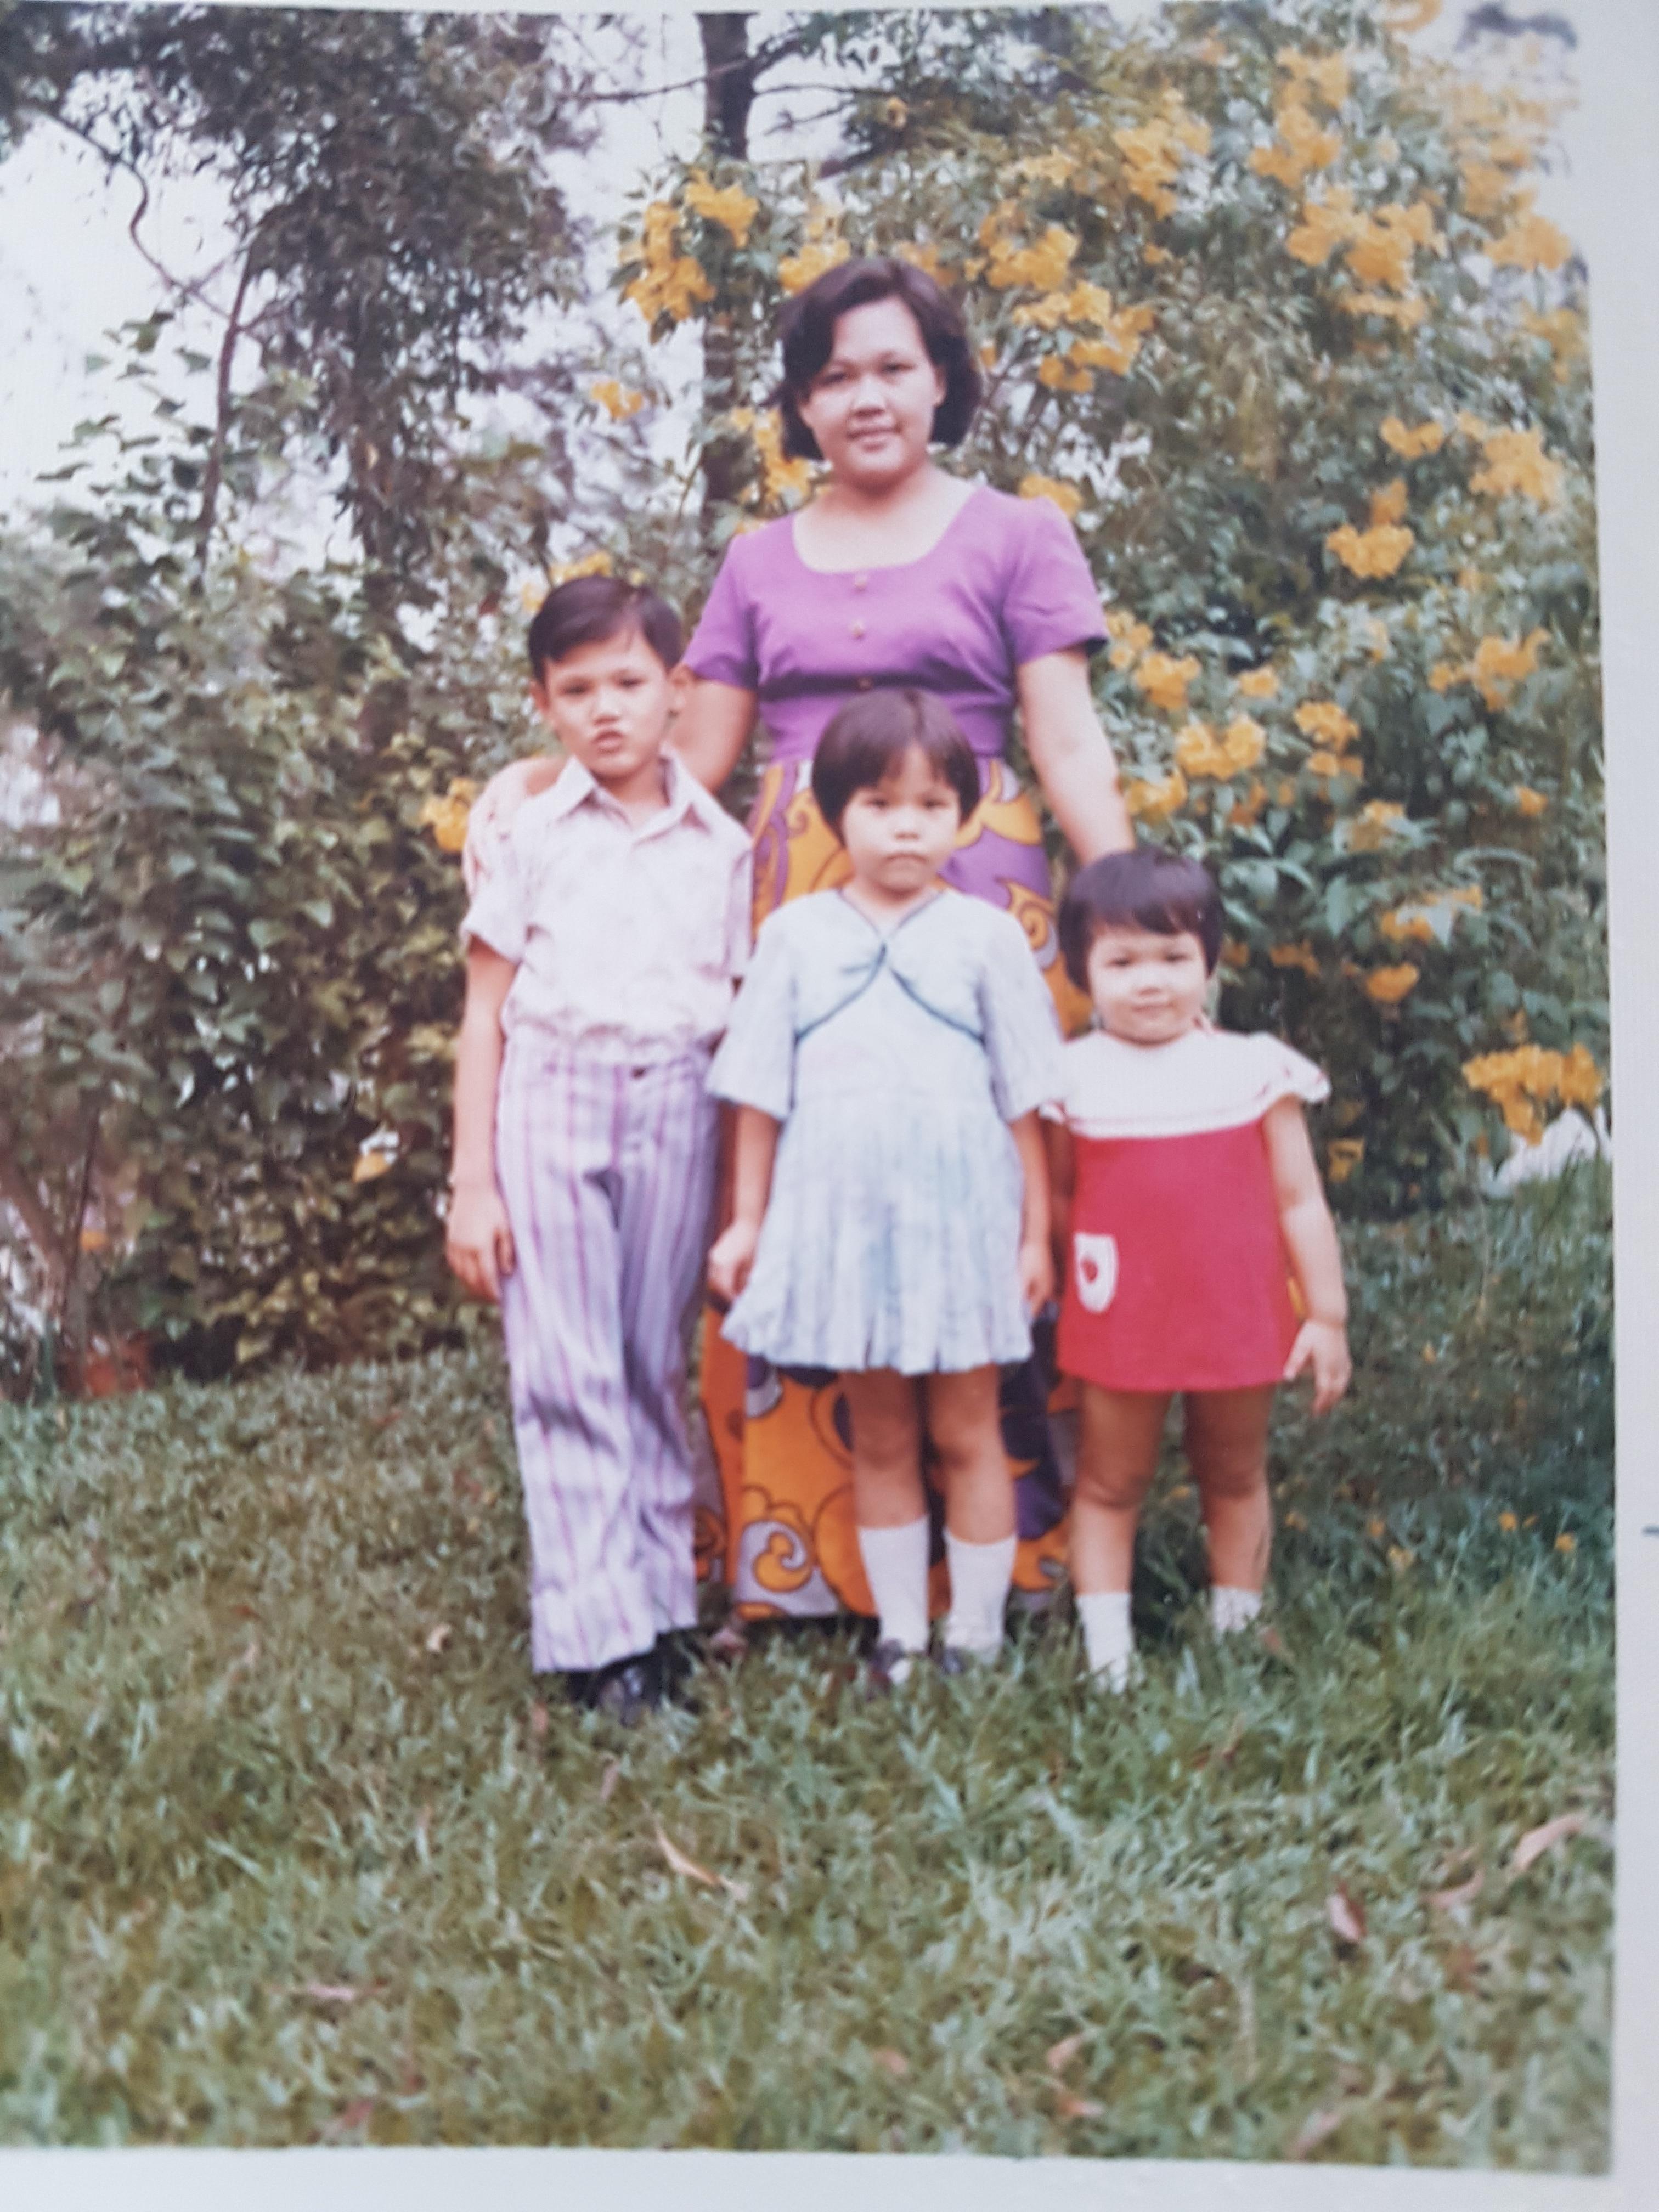 Ming was born in Kuala Lumpur Malaysia before migrating to Australia.